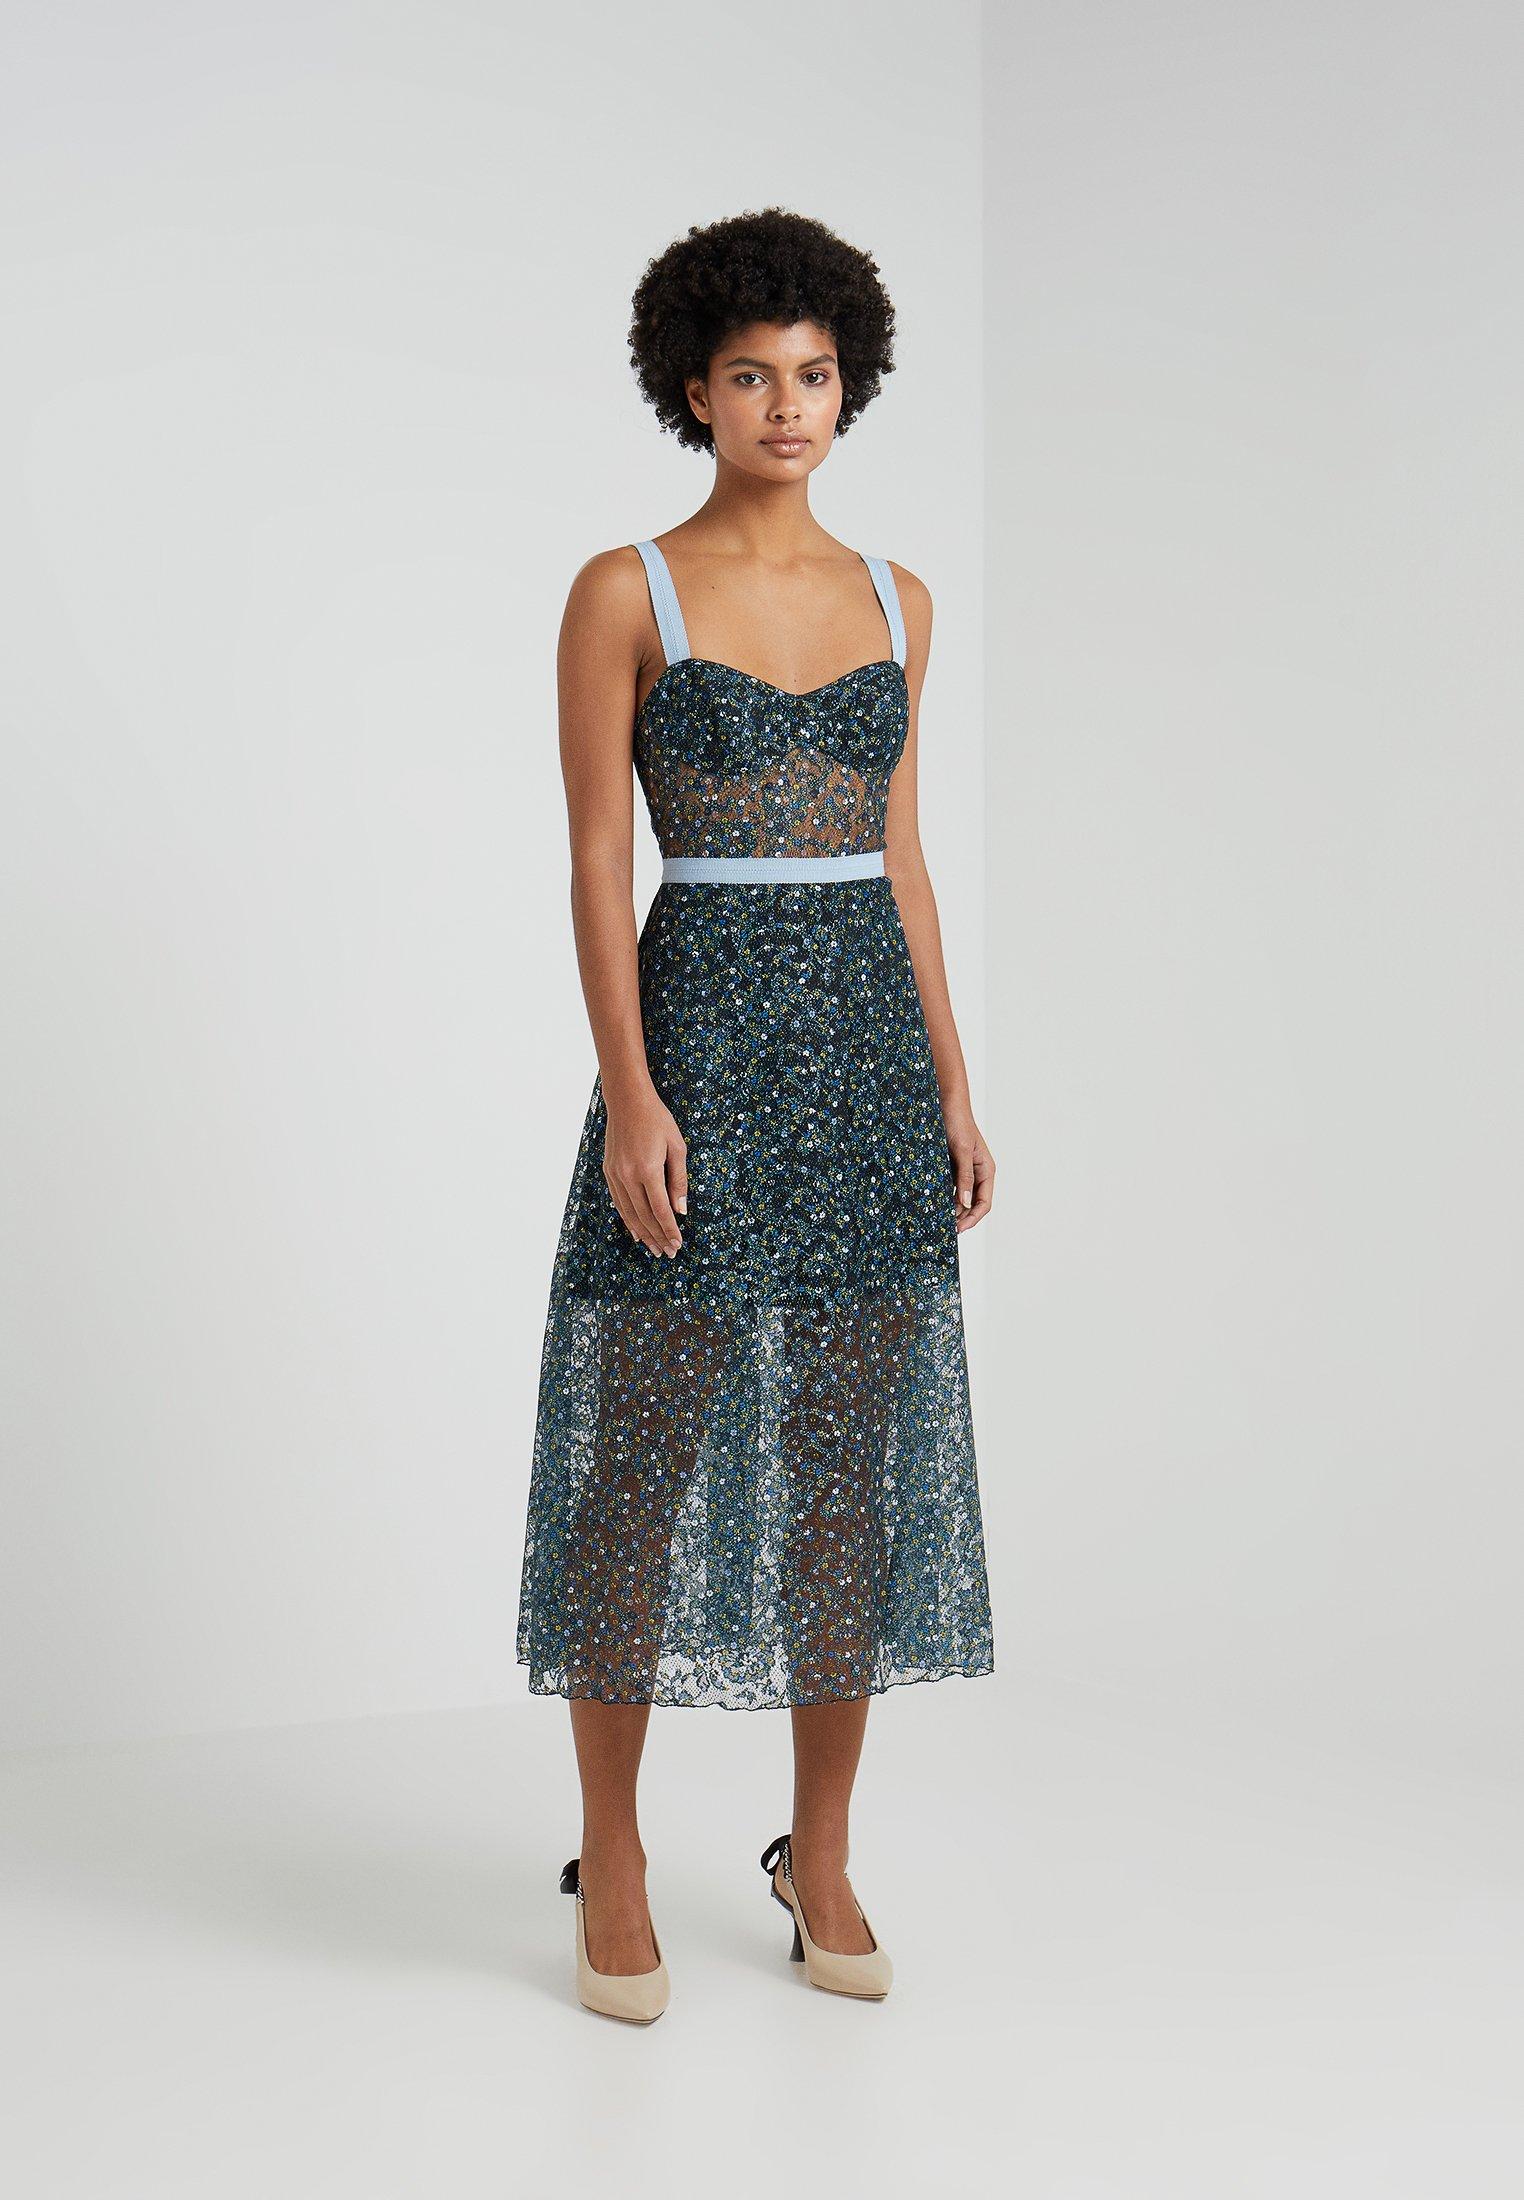 DressRobe Bustier De Blue Allen Cocktail Schwartz Eden HW2Y9IeED